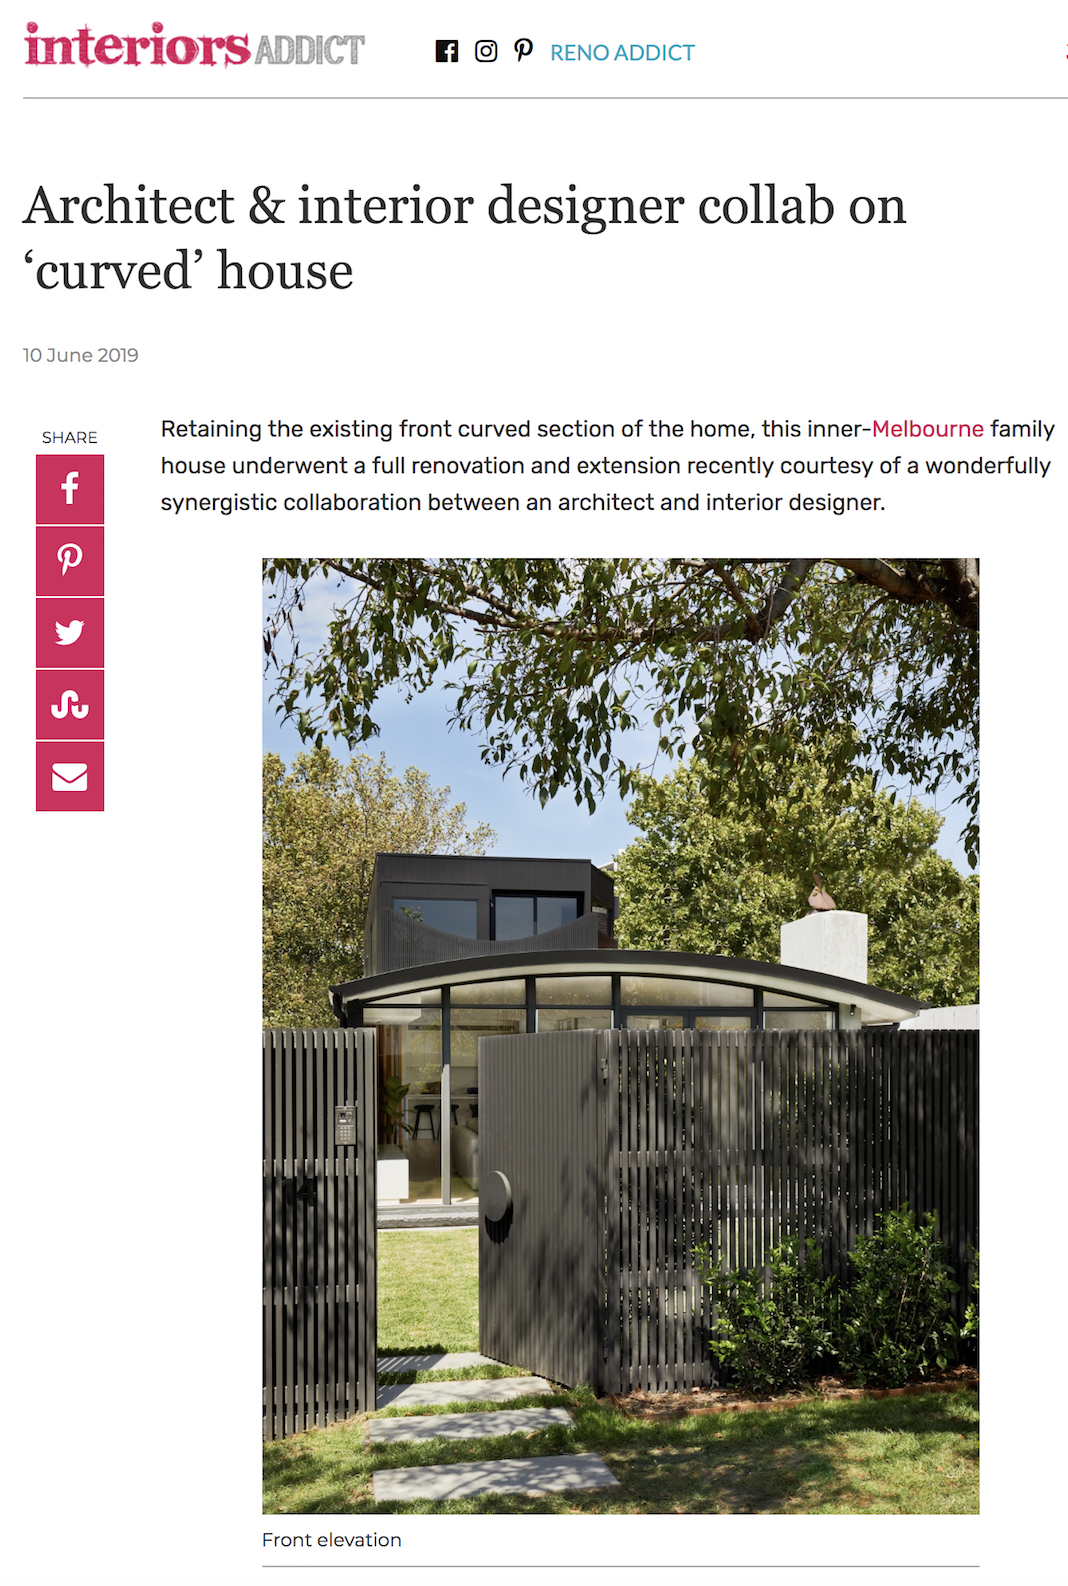 Sarah Elshaug, Maitland Street Interiors, The Curved House, Melbourne Interior Decorator, Interior Stylist